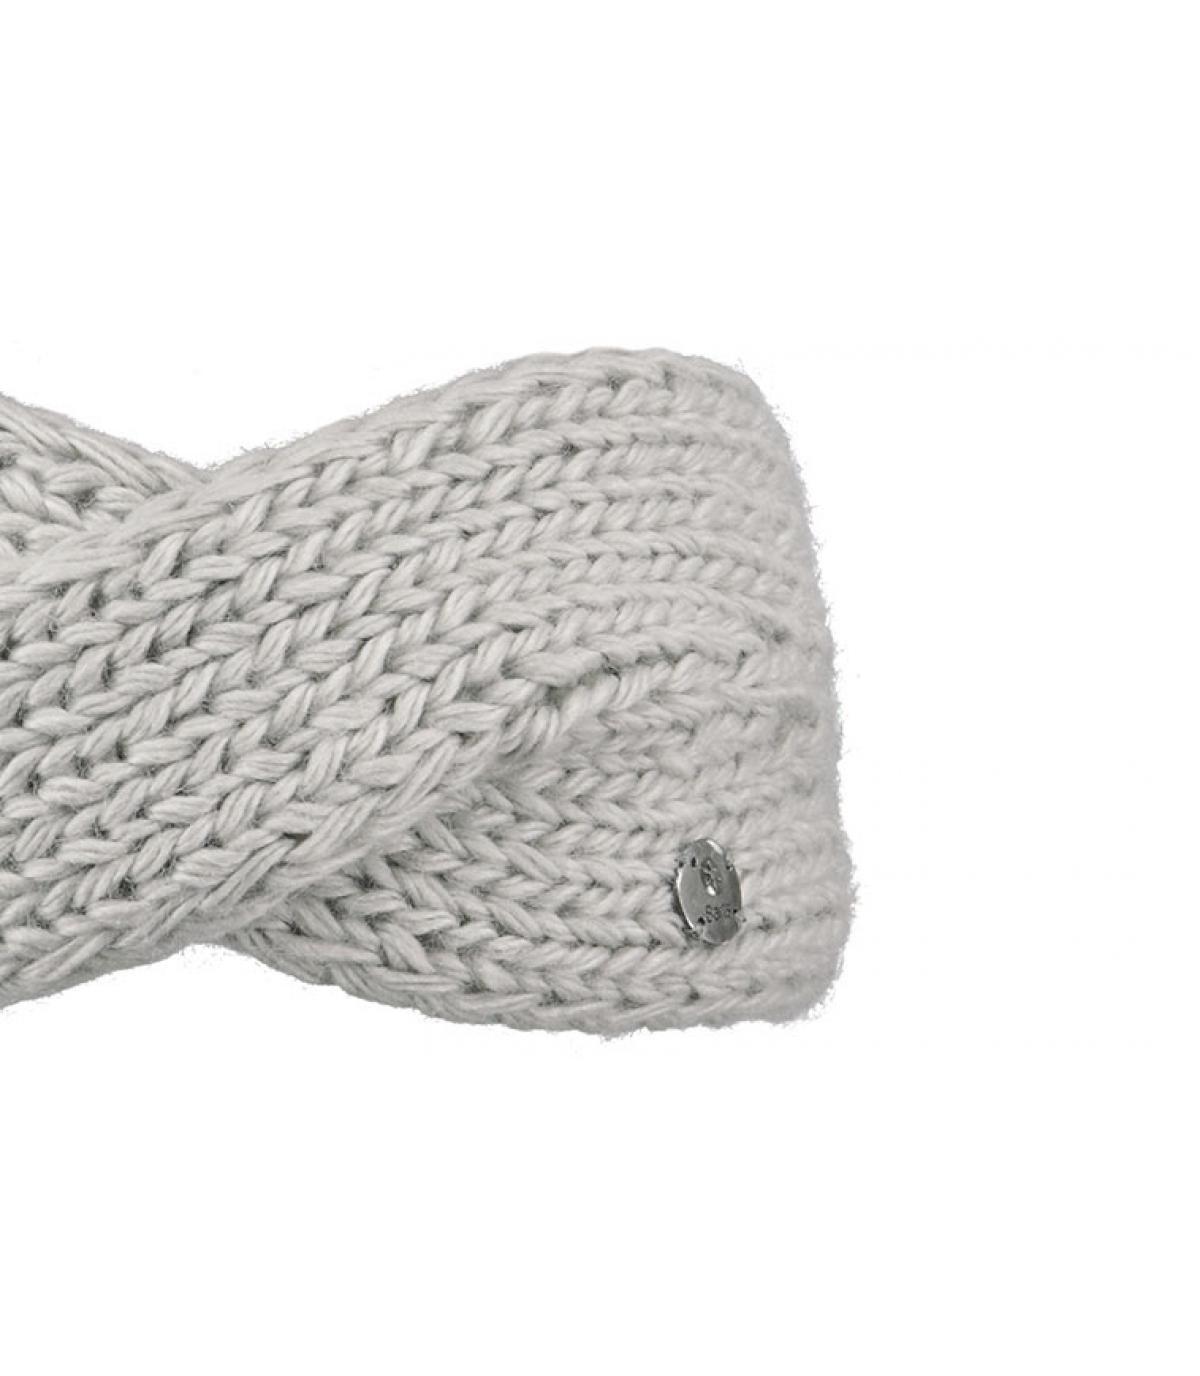 Détails Yogi Headband oyster - image 3